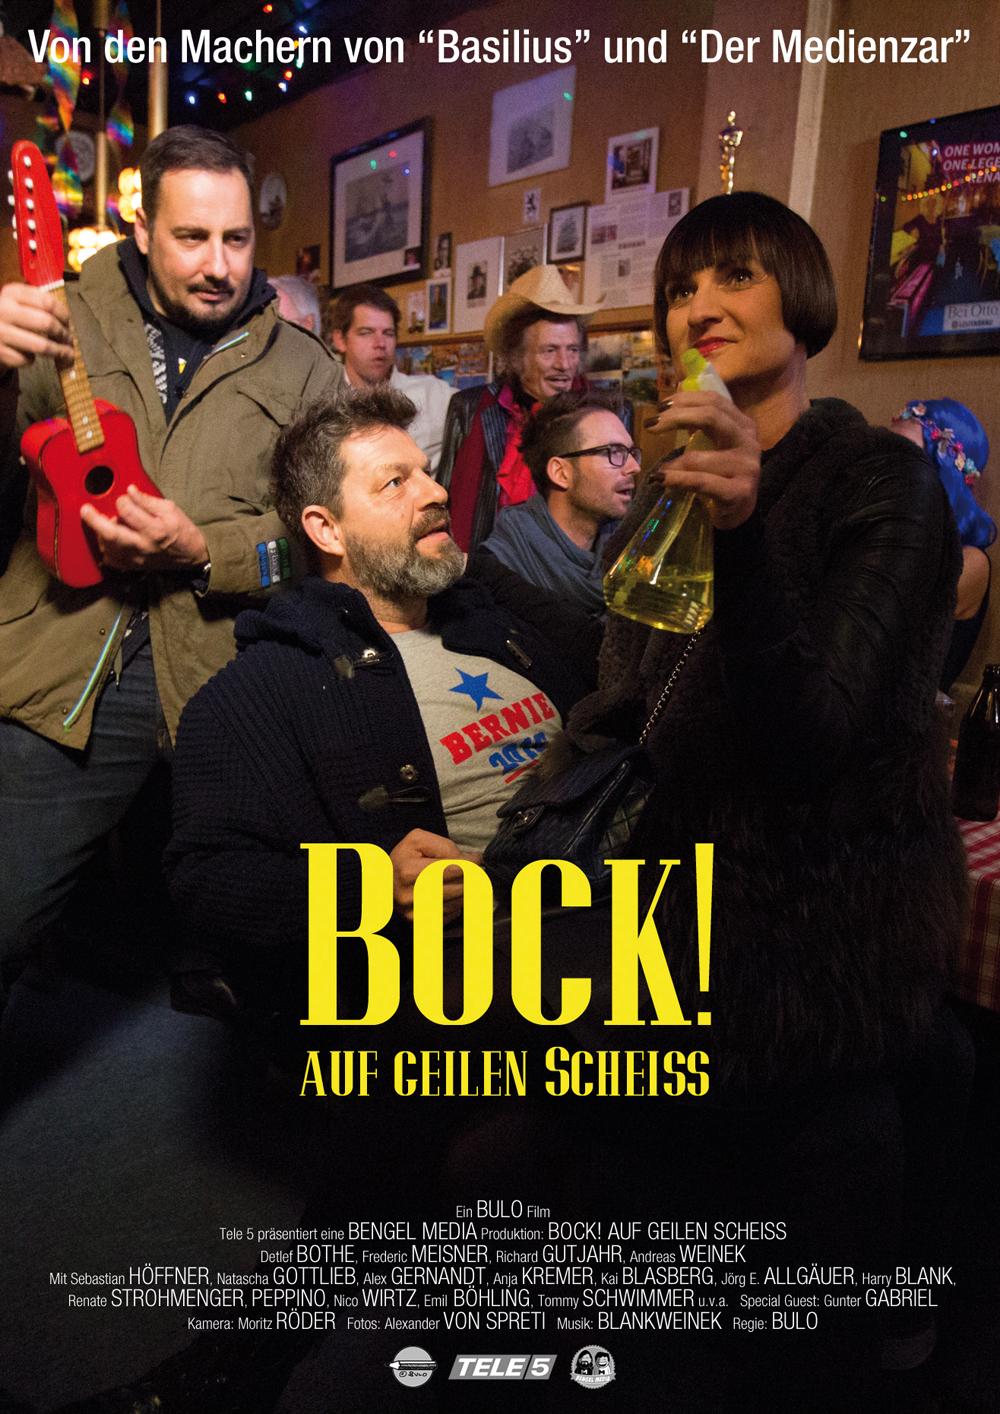 das-bock-poster_1000pxl